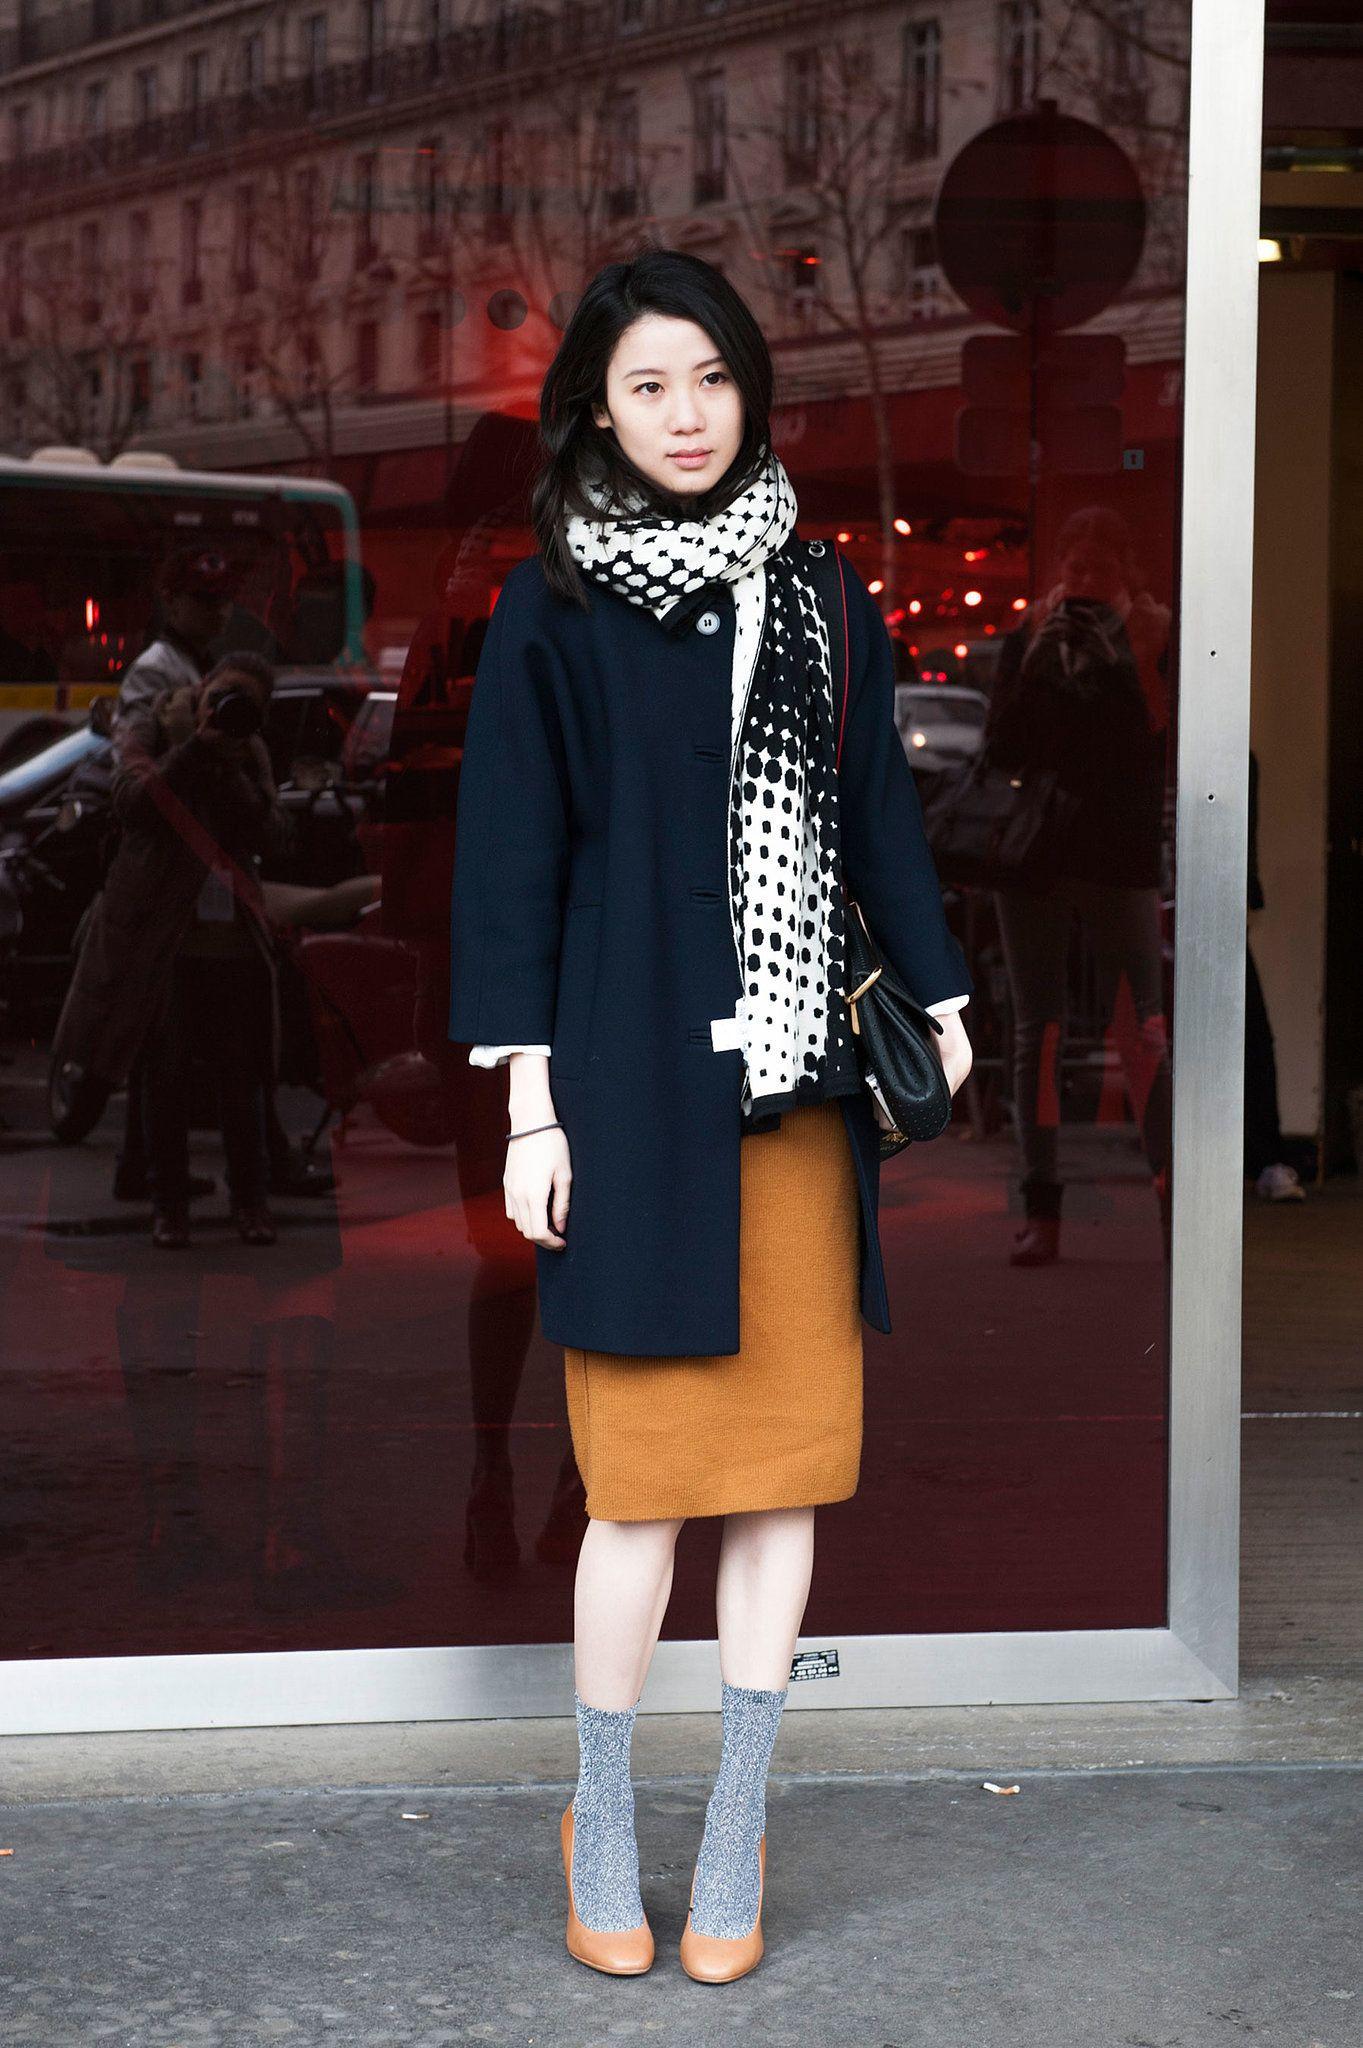 Socks and pumps. Streetstyle Paris Fashion Week Fall 2014